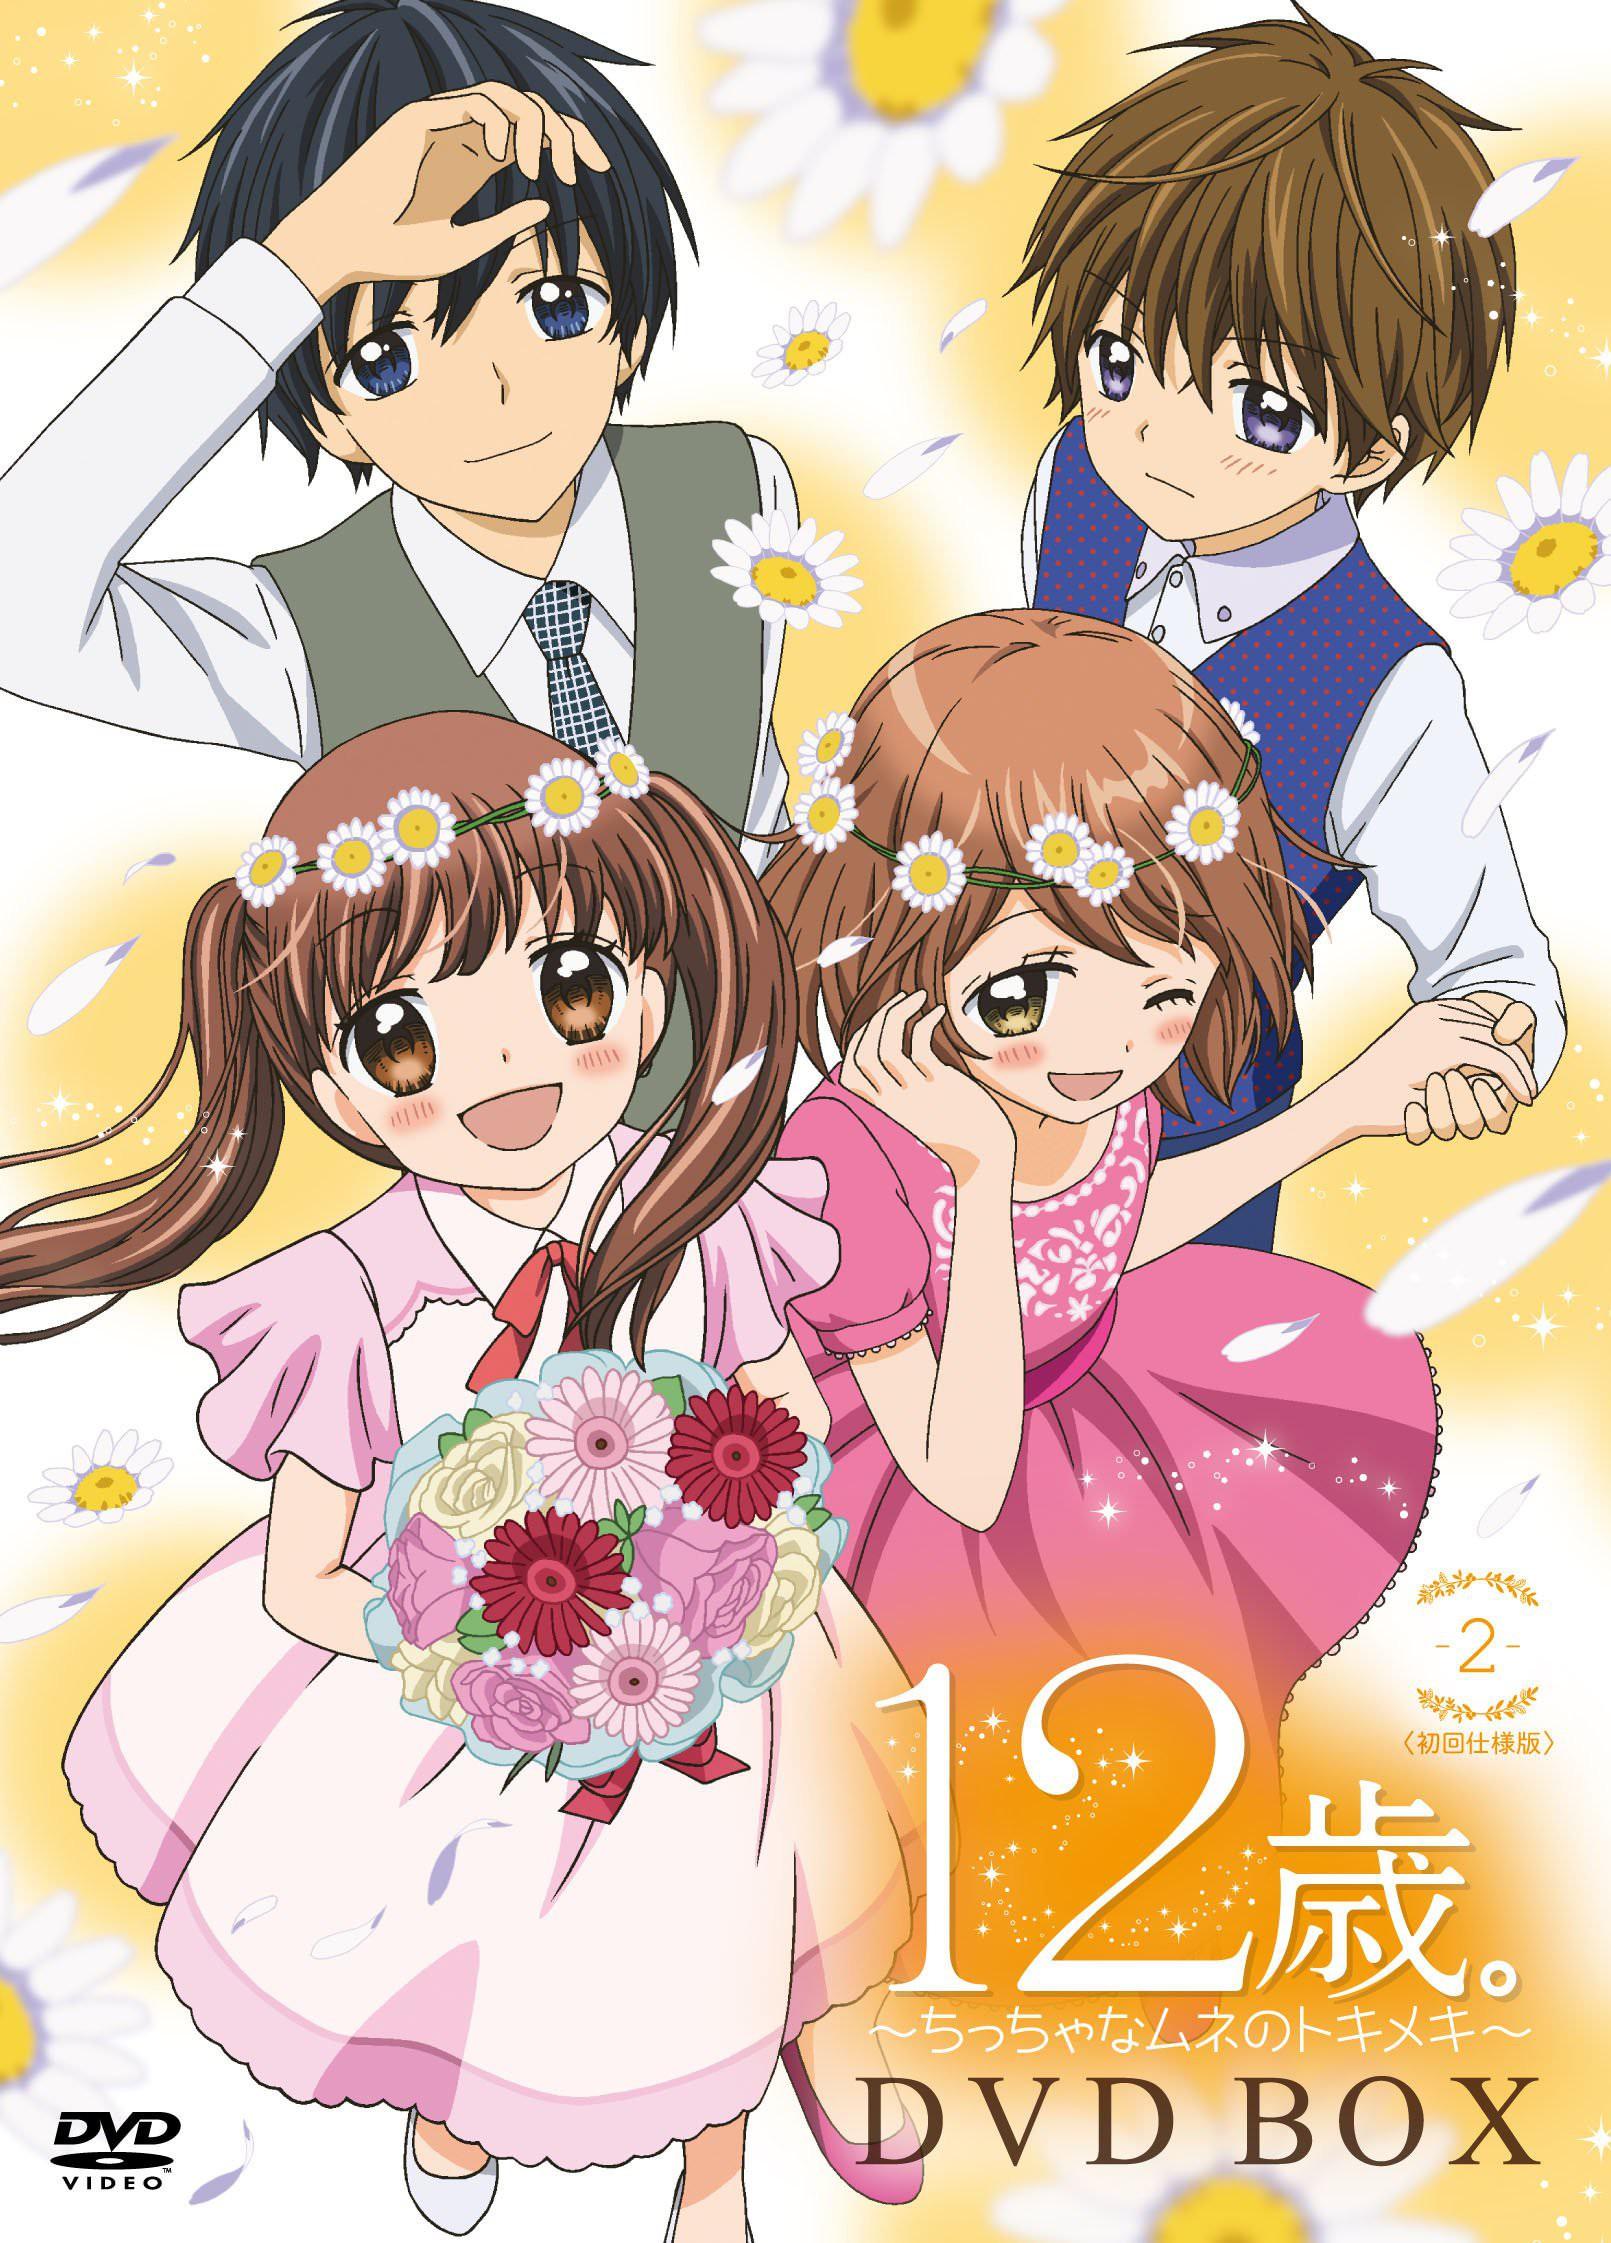 >12-sai Chicchana Mune no Tokimeki ตอนที่ 1-12 ซับไทย